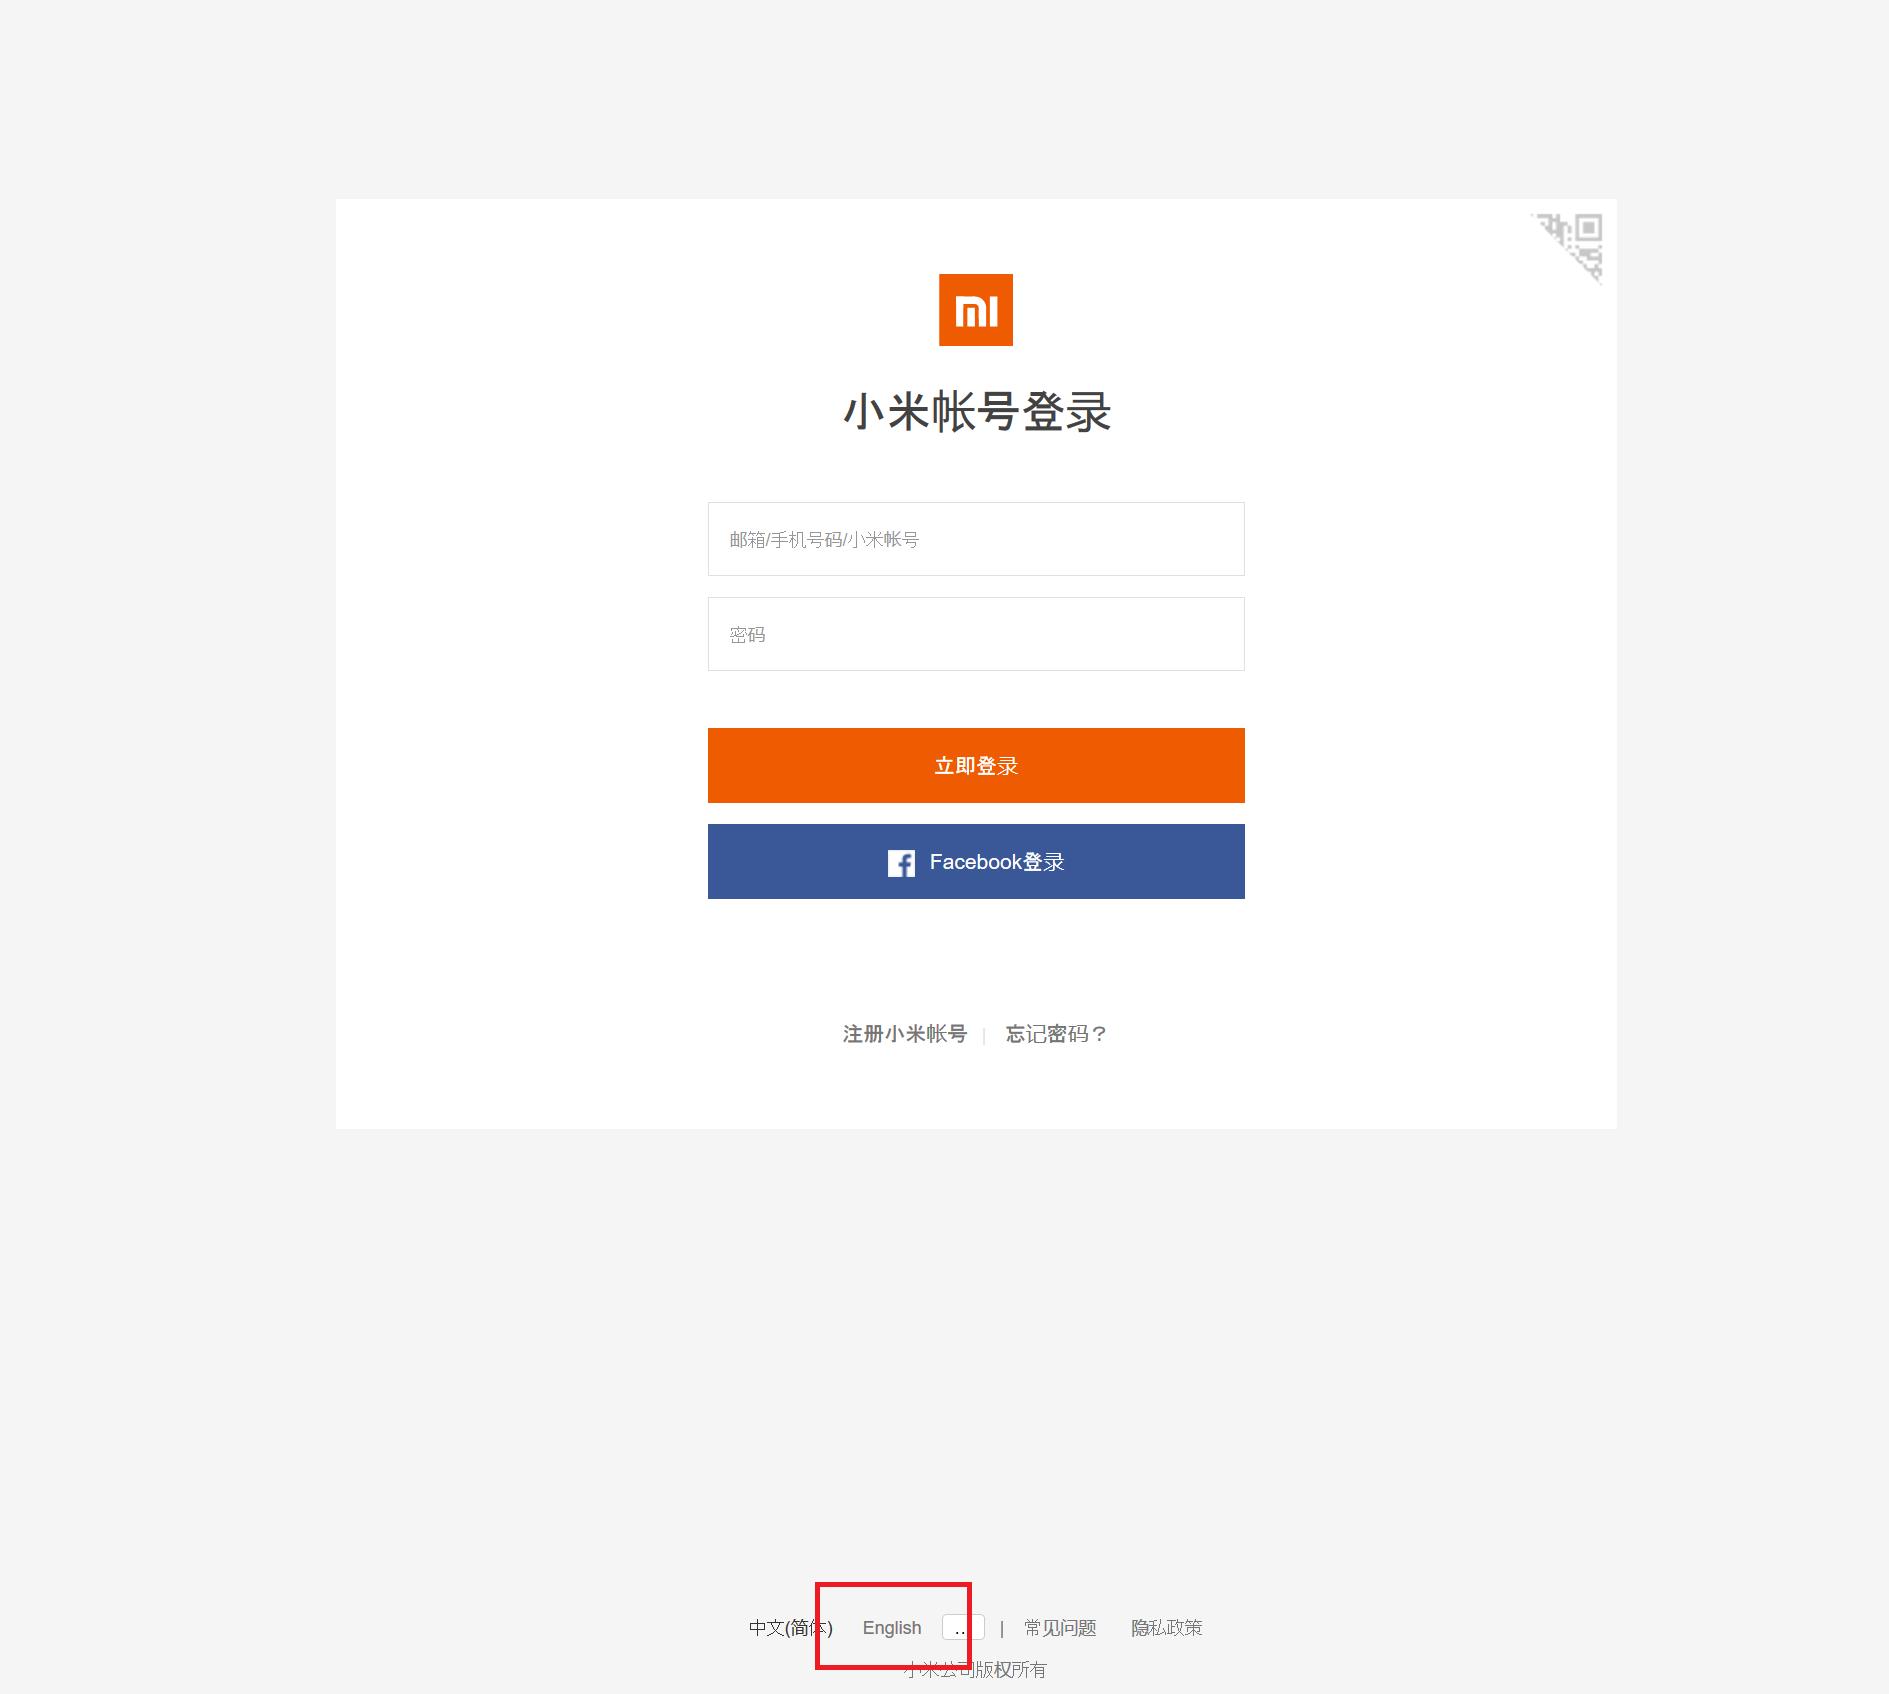 Anleitung Bootloader bei Xiaomi Handys entsperren